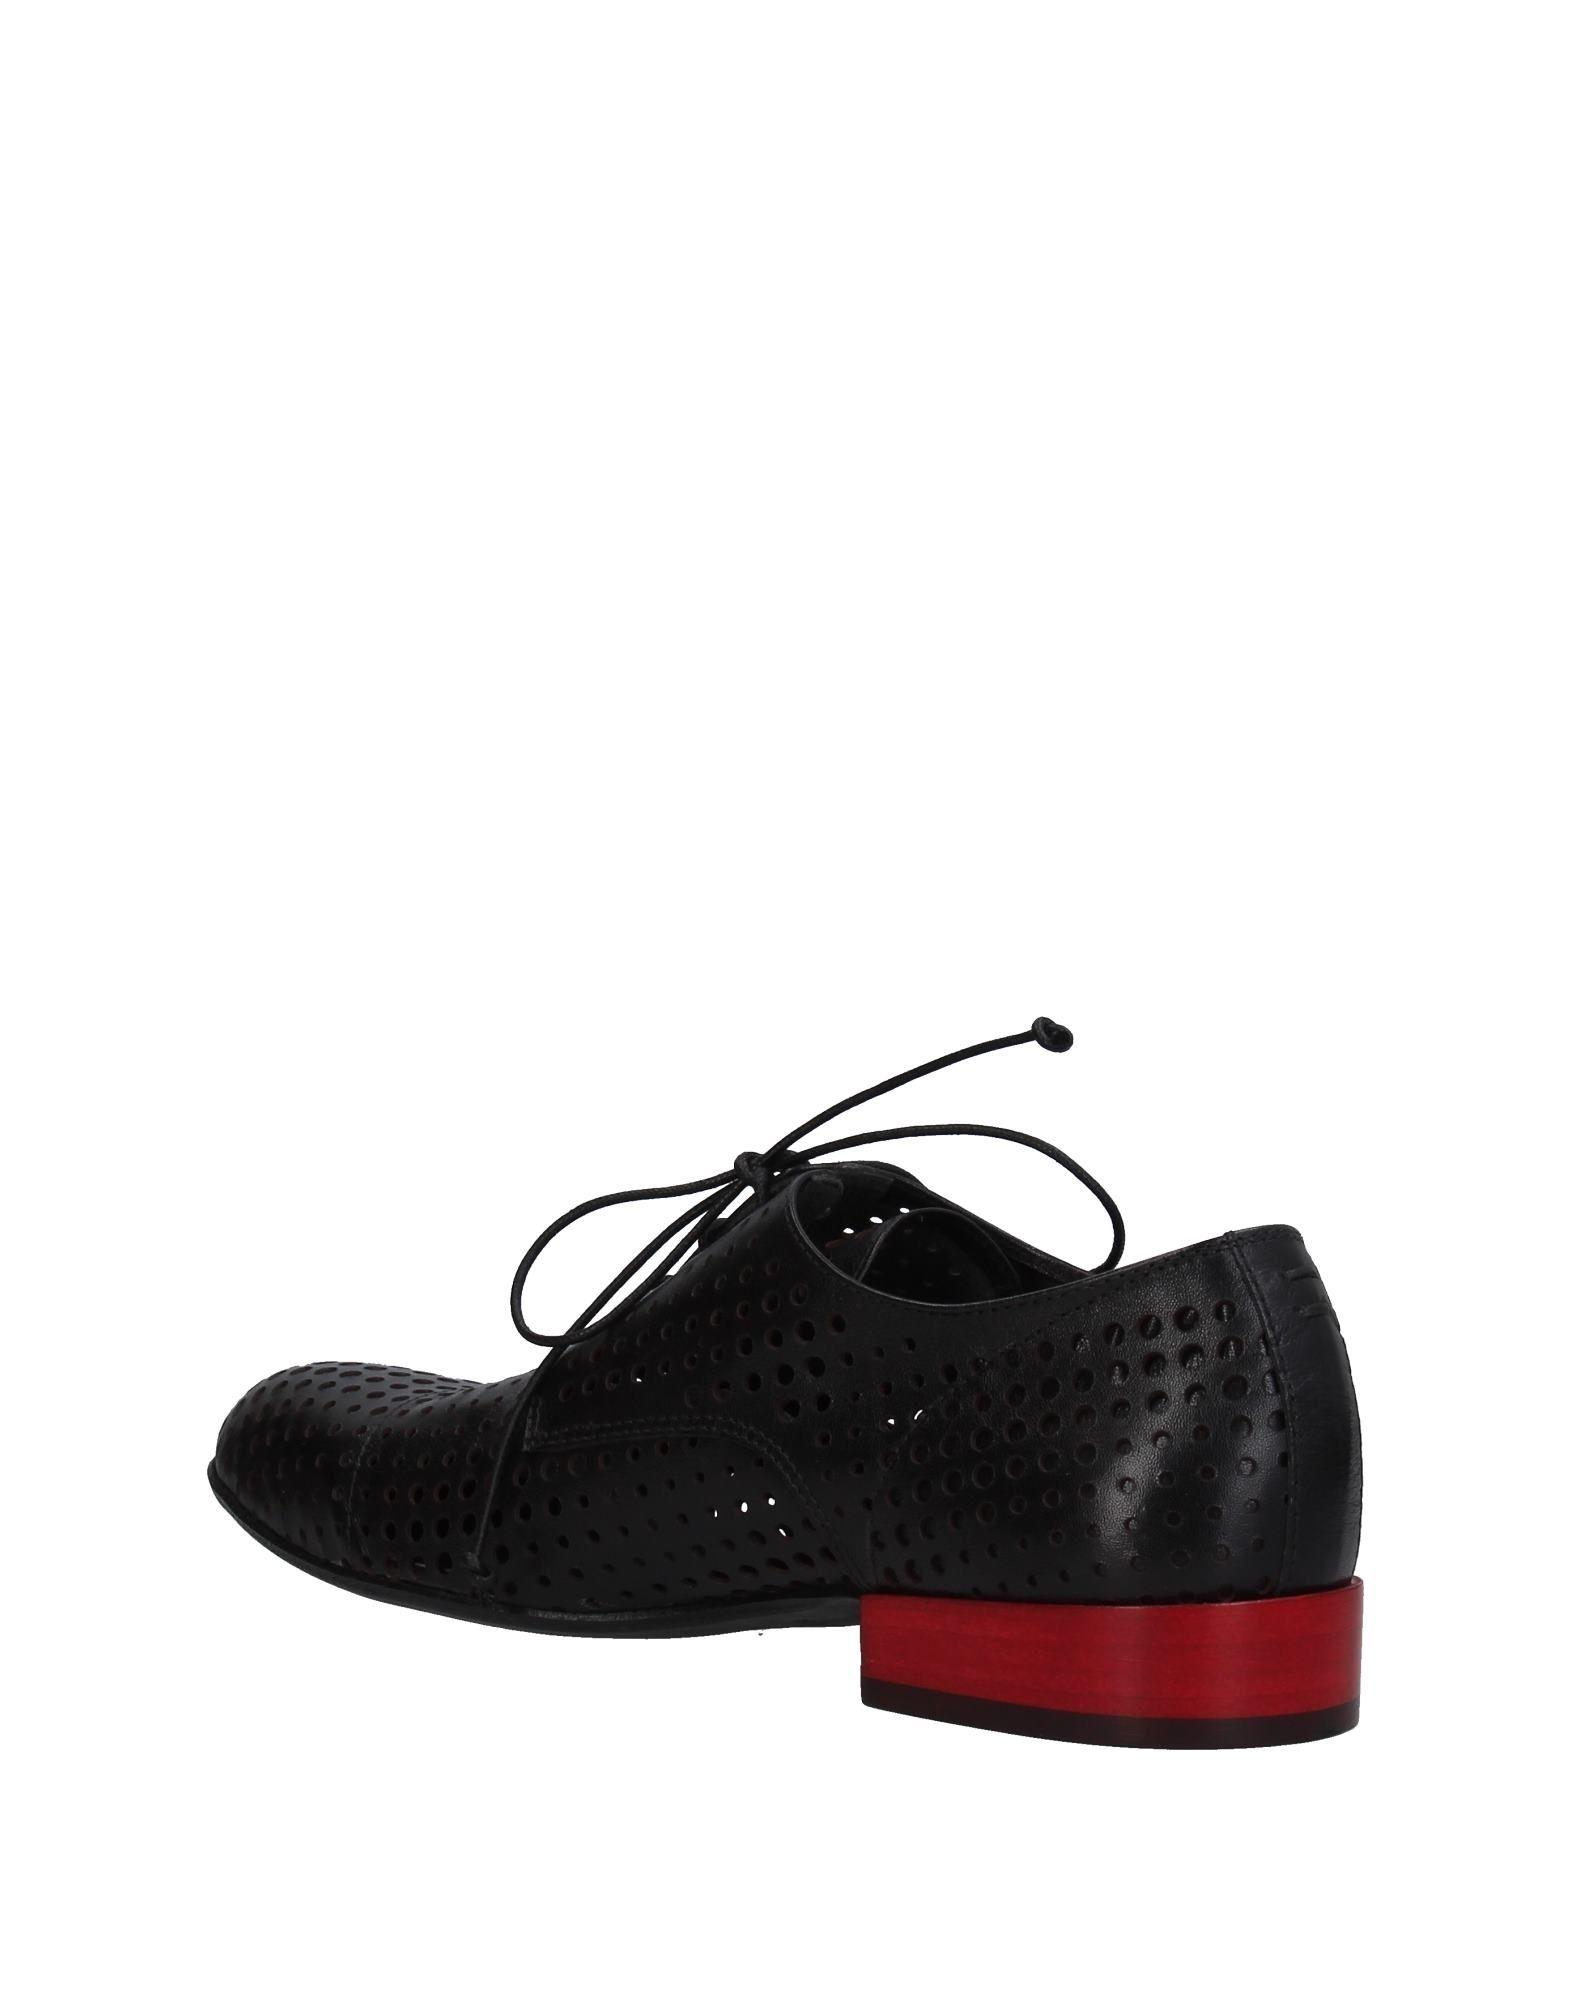 CHAUSSURES - Chaussures à lacetsHalmanera vzdZj